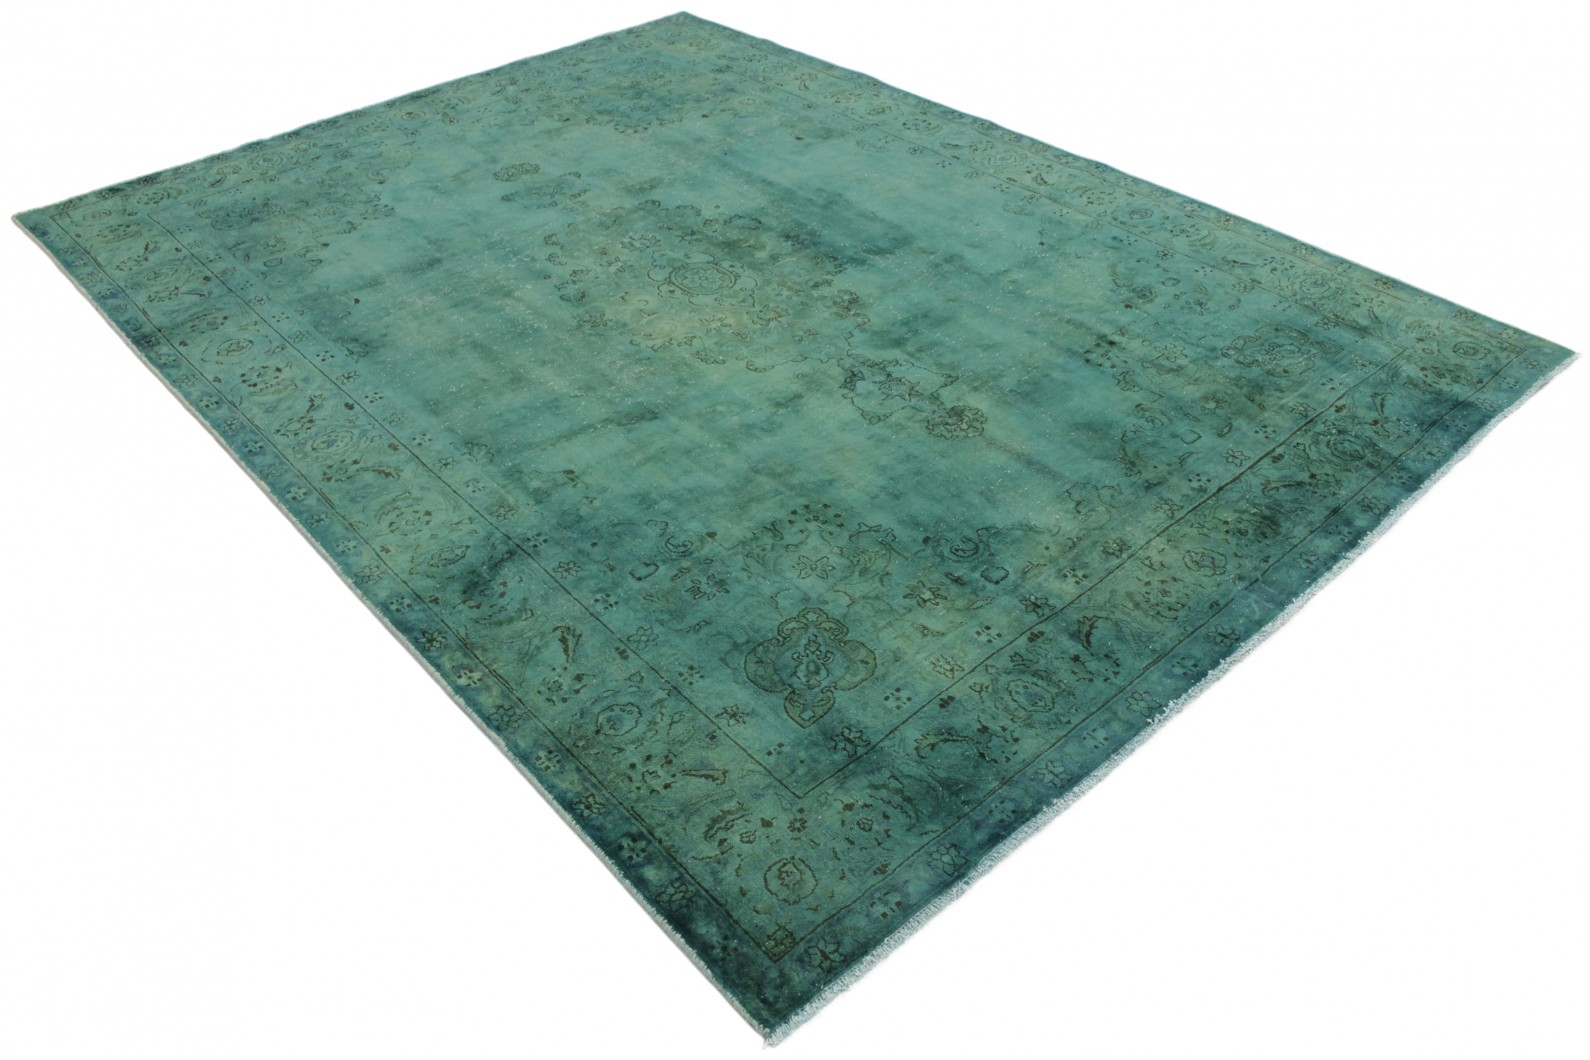 vintage teppich t rkis in 310x230 1001 177289 bei. Black Bedroom Furniture Sets. Home Design Ideas